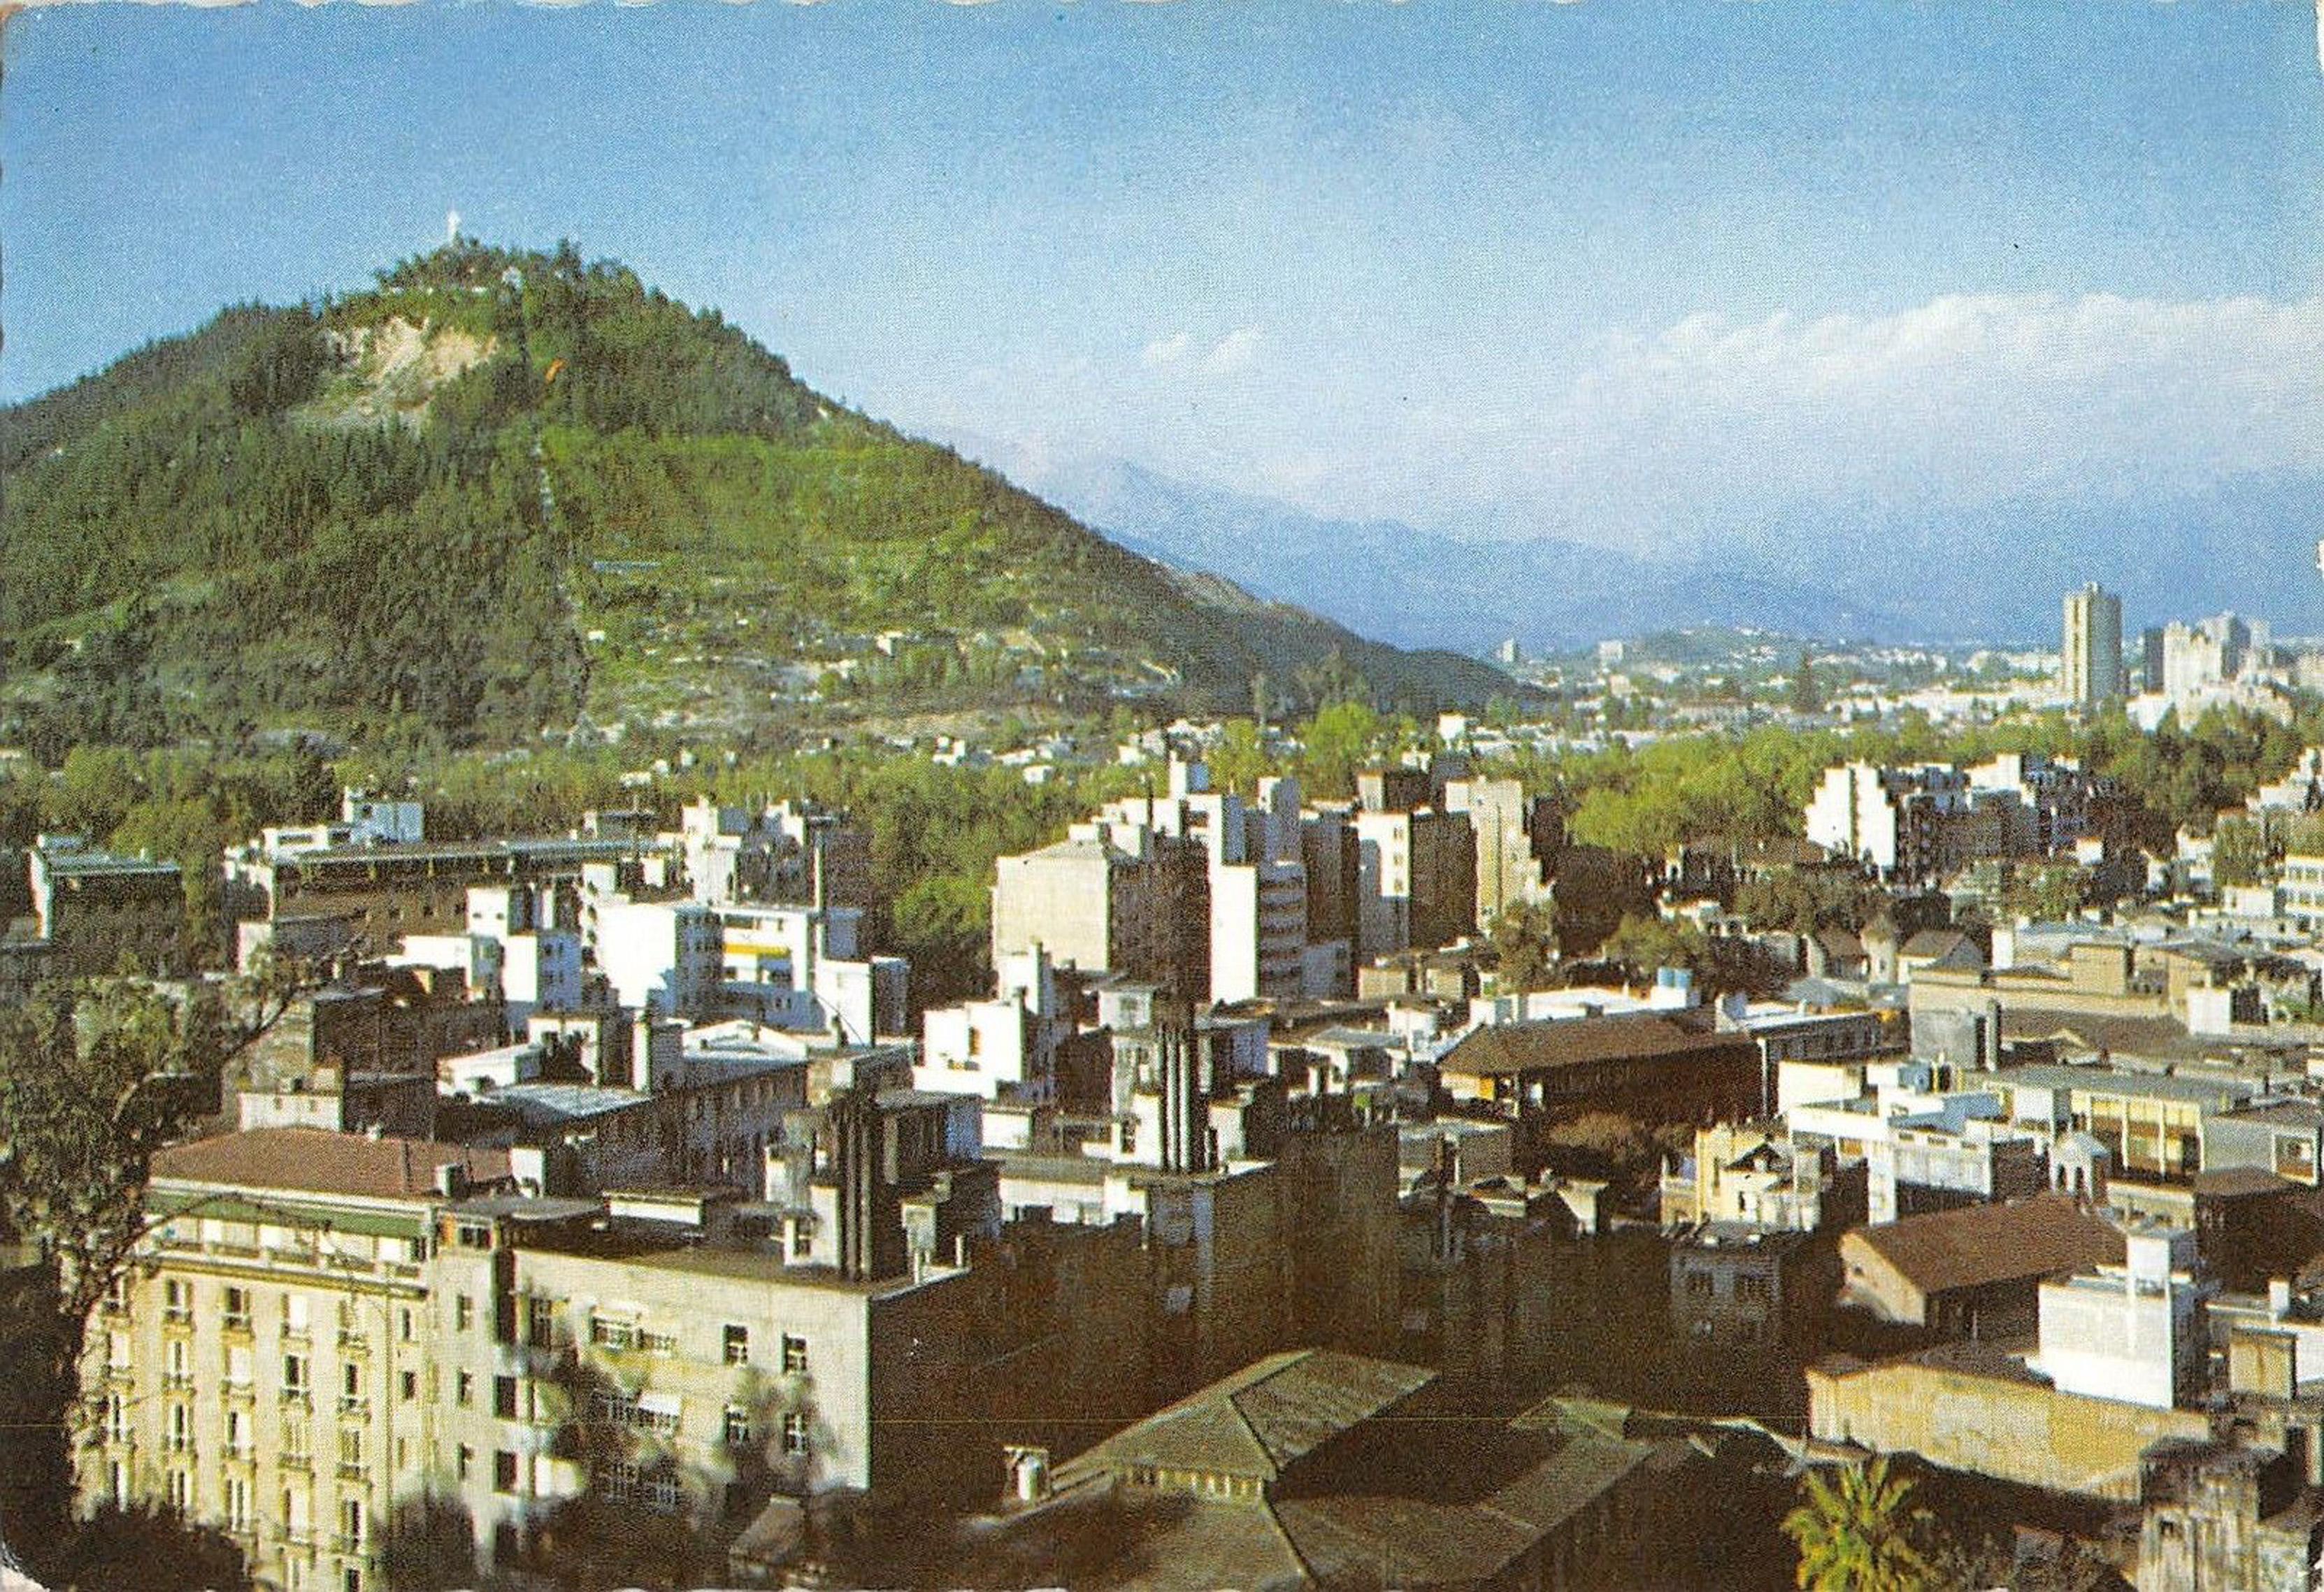 Enterreno - Fotos históricas de chile - fotos antiguas de Chile - Centro de Santiago en 1965